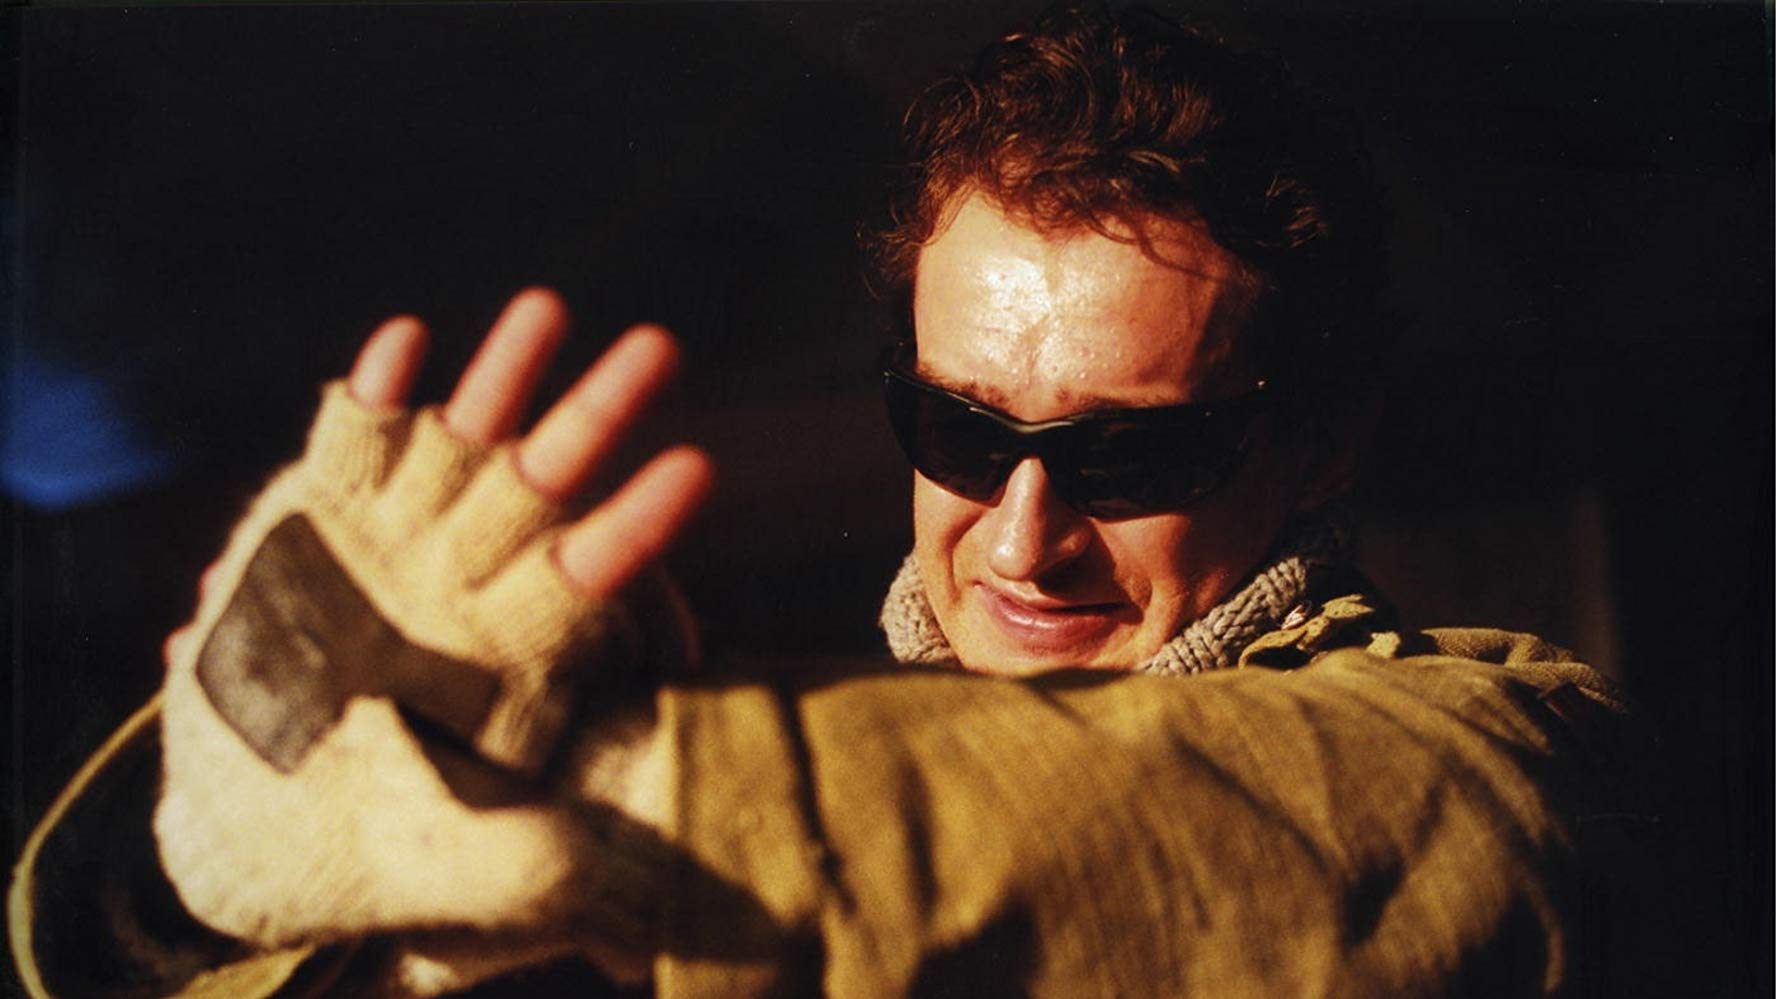 Konstantin Khabensky as Anton Gorodetsky in Day Watch (2006)